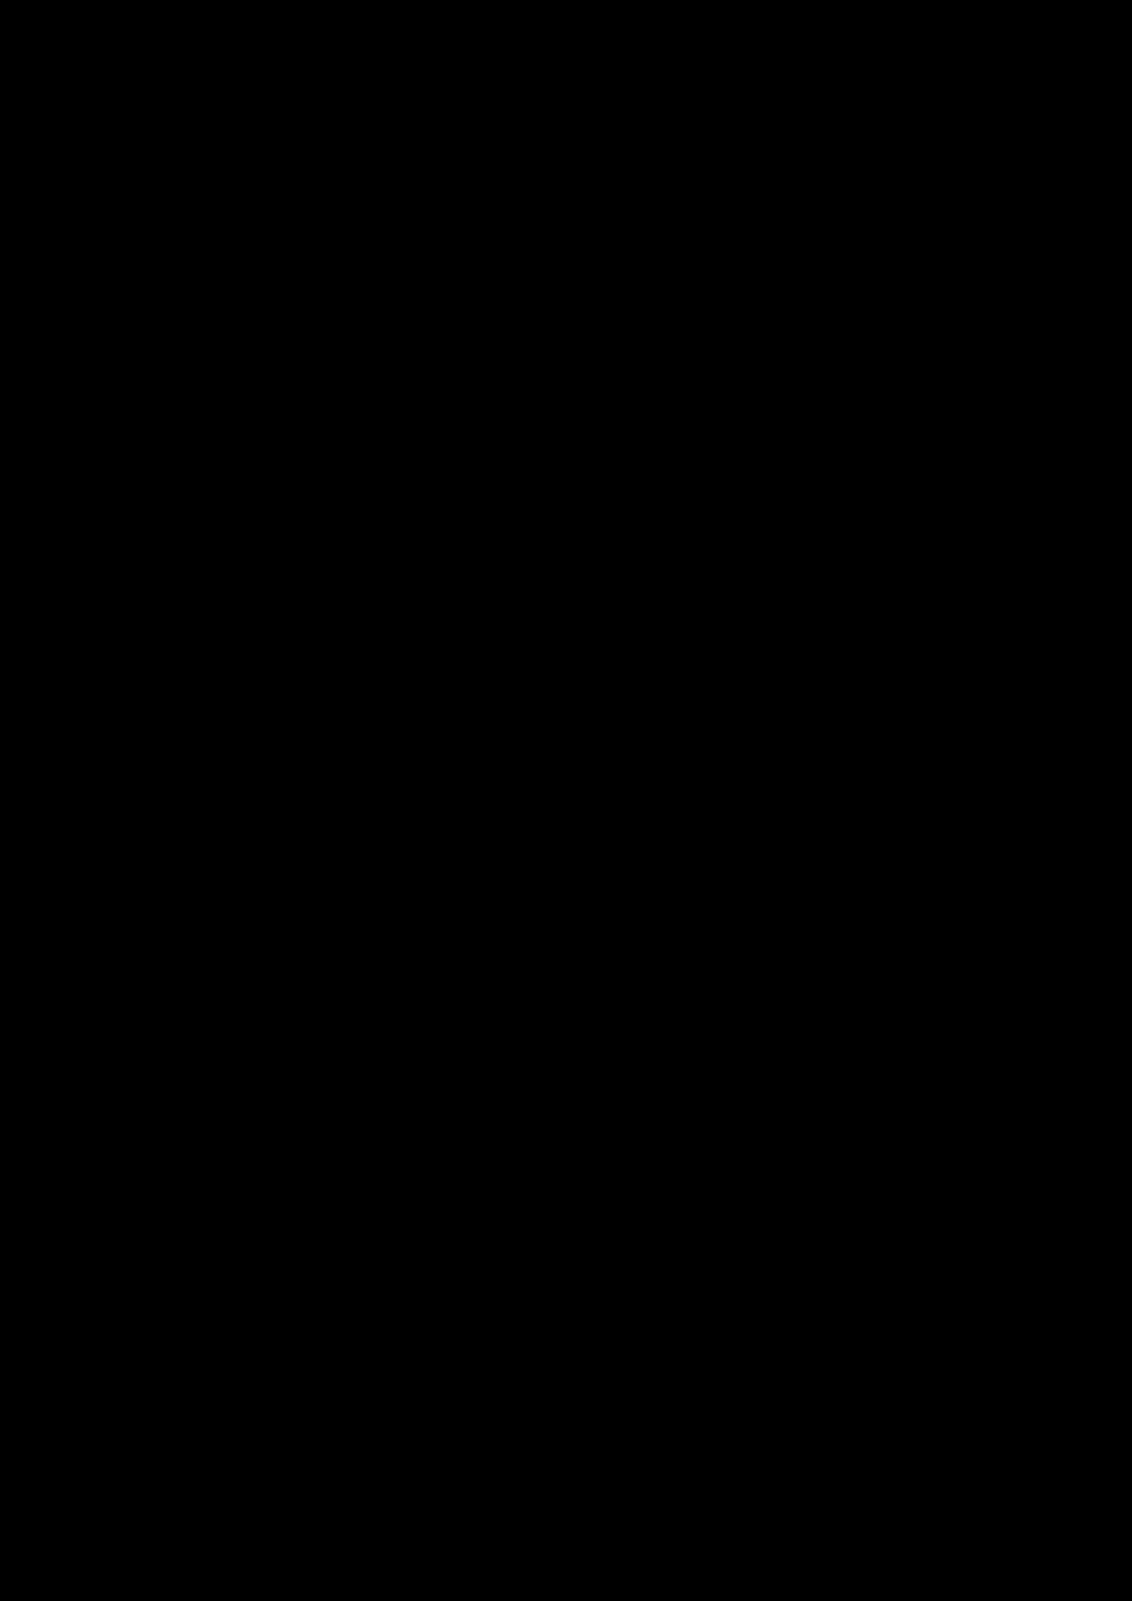 Ispoved Pervogo Boga slide, Image 55